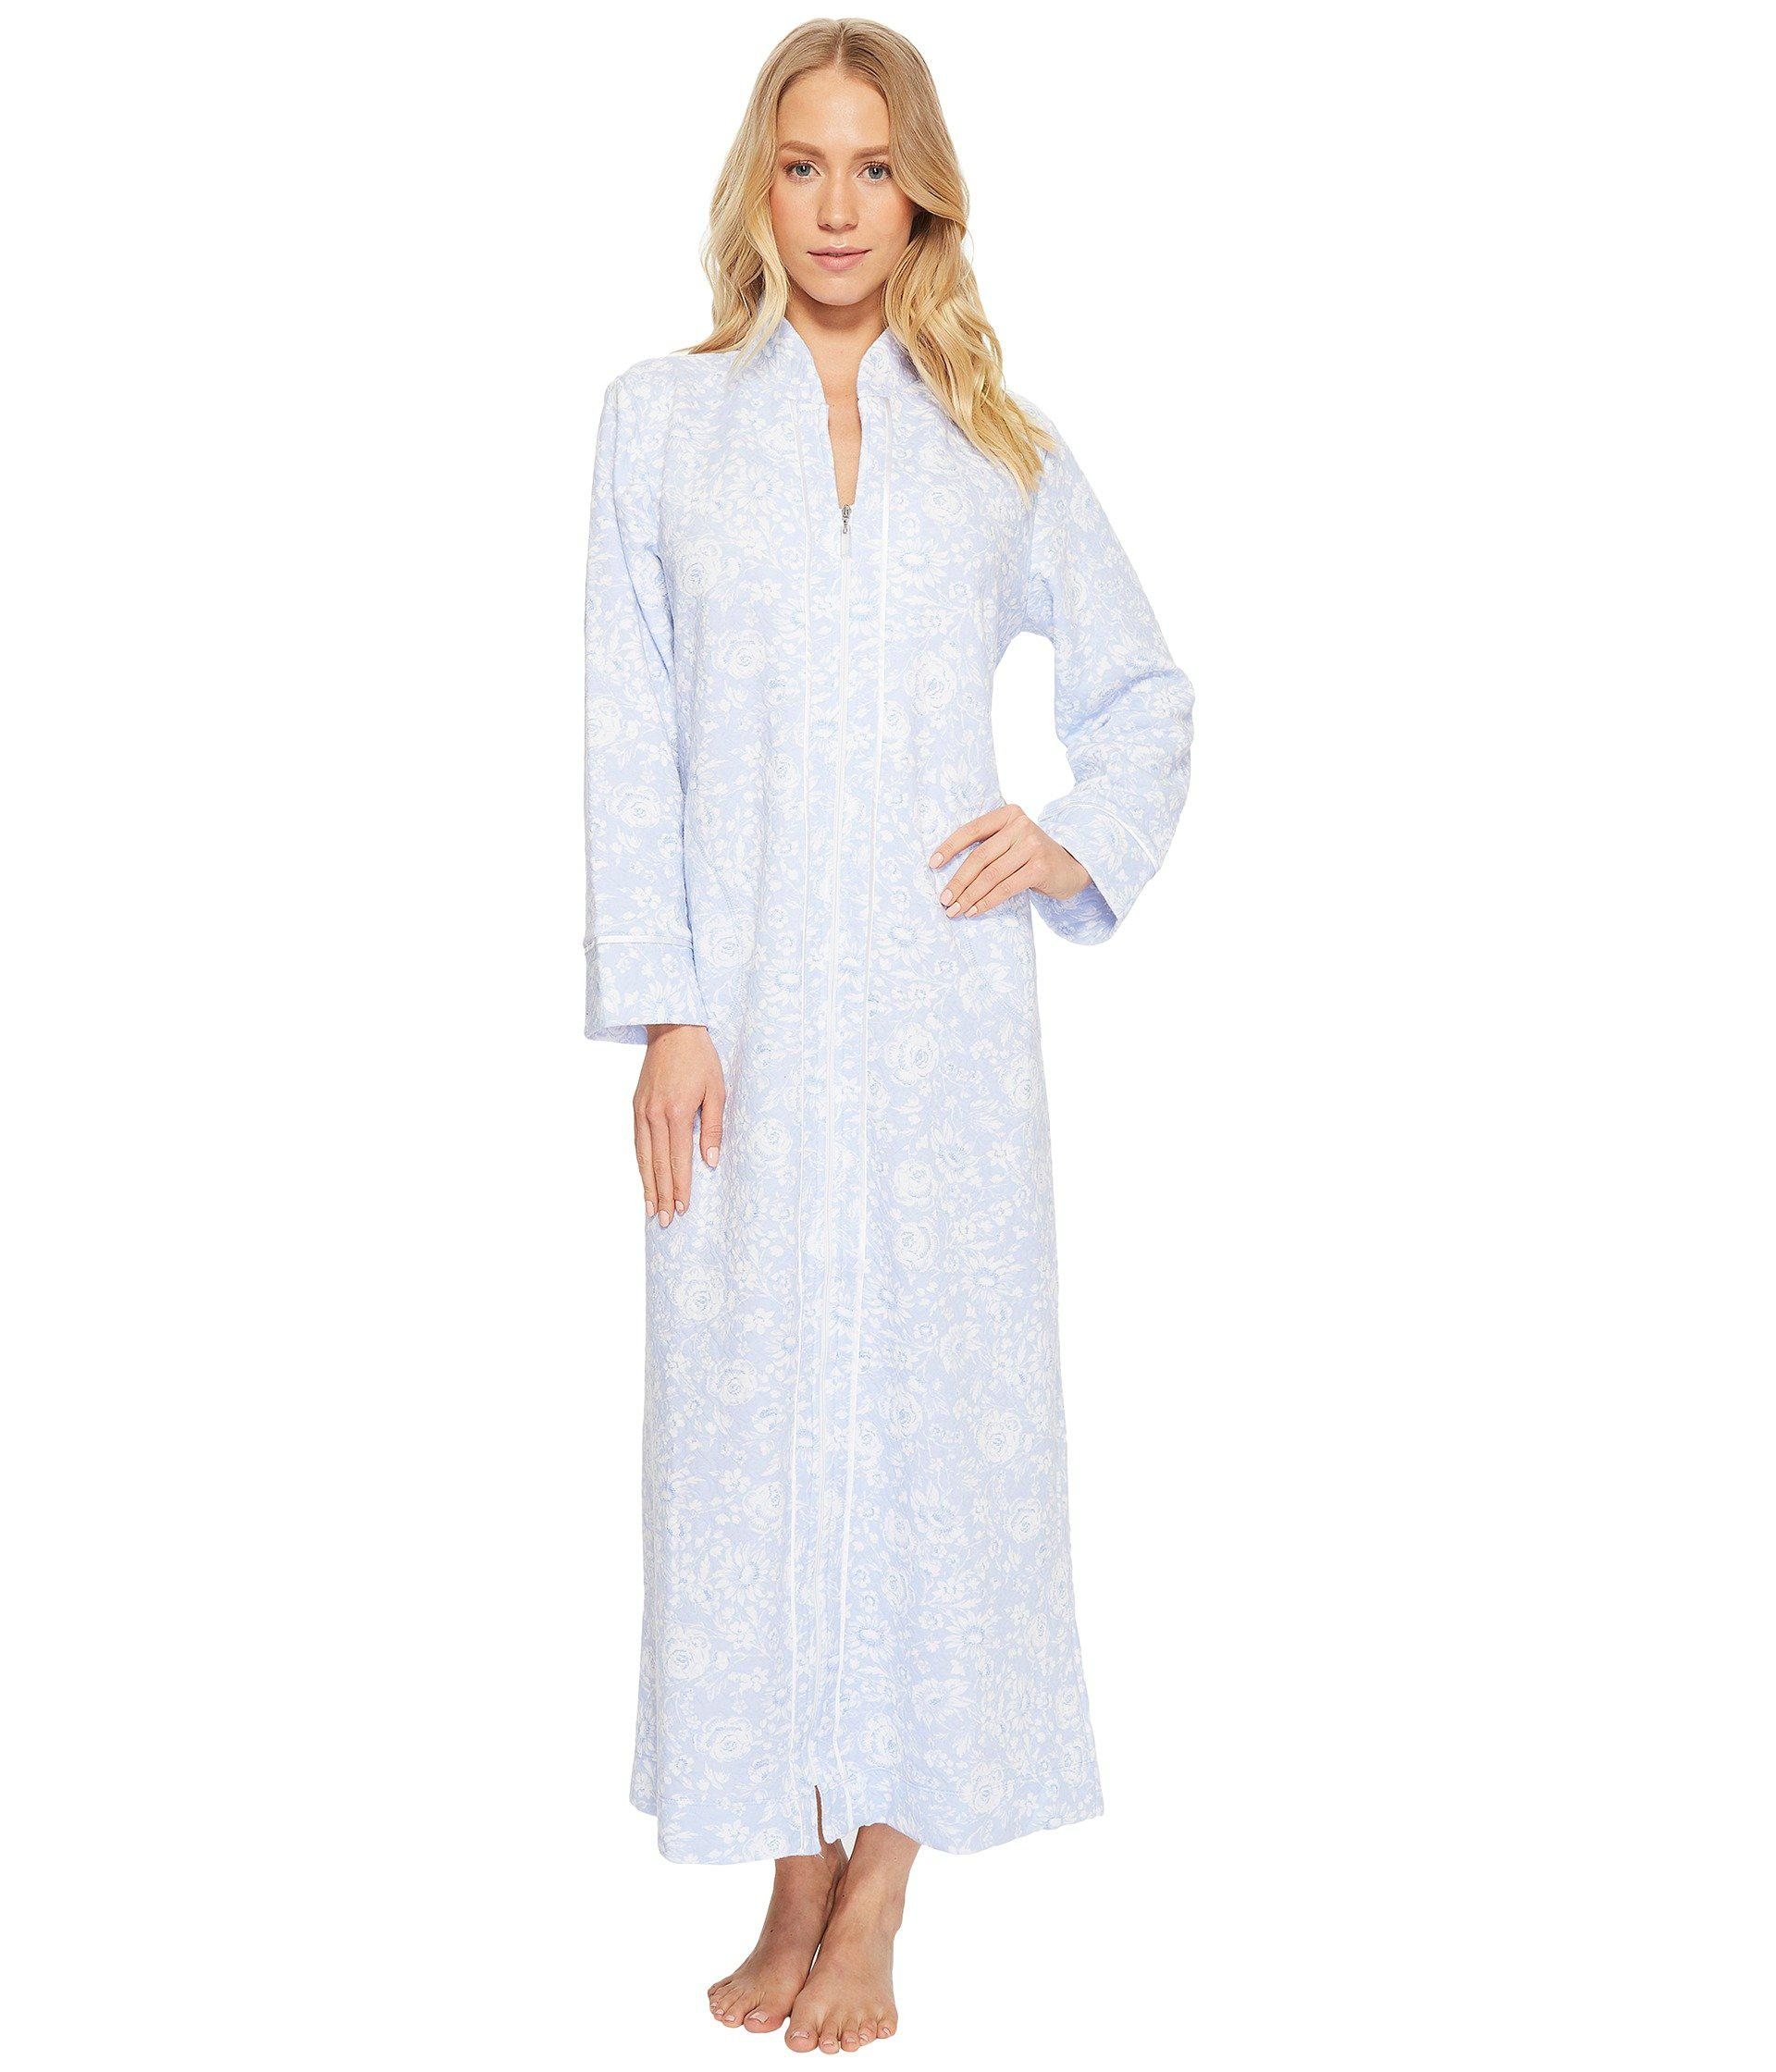 Lyst - Carole Hochman Quilted Zip Robe in Blue